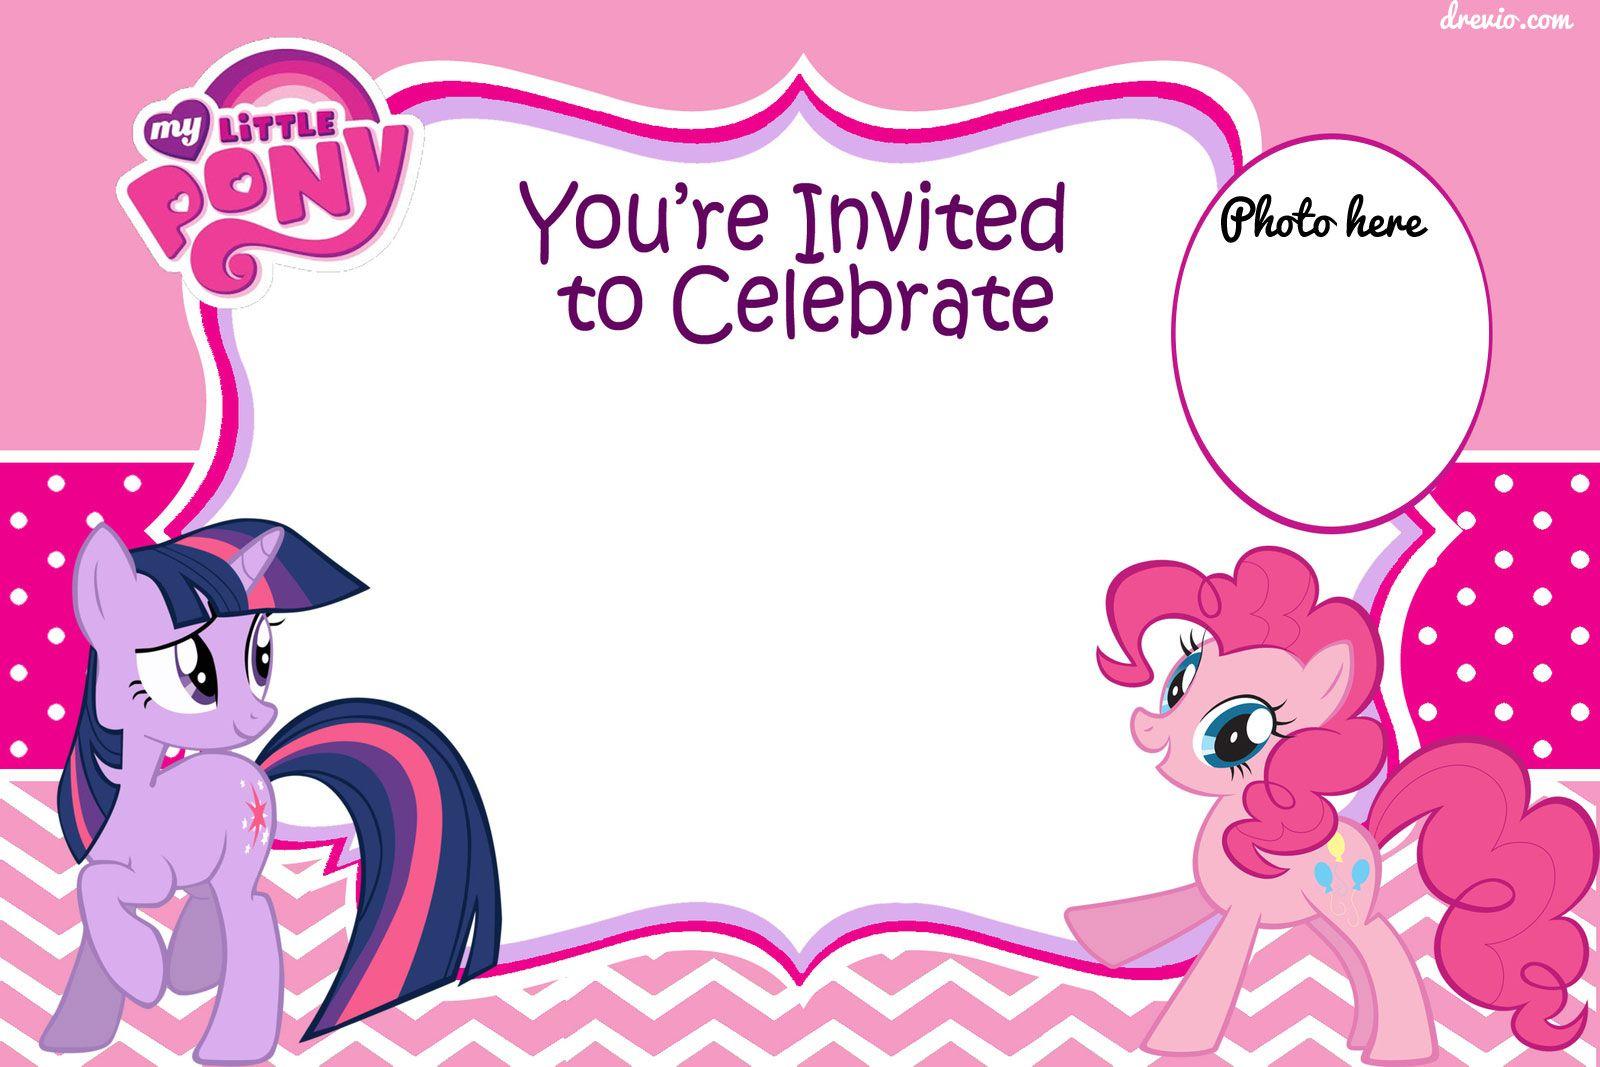 Free Printable My Little Pony Birthday Invitation Template - Free Printable My Little Pony Thank You Cards